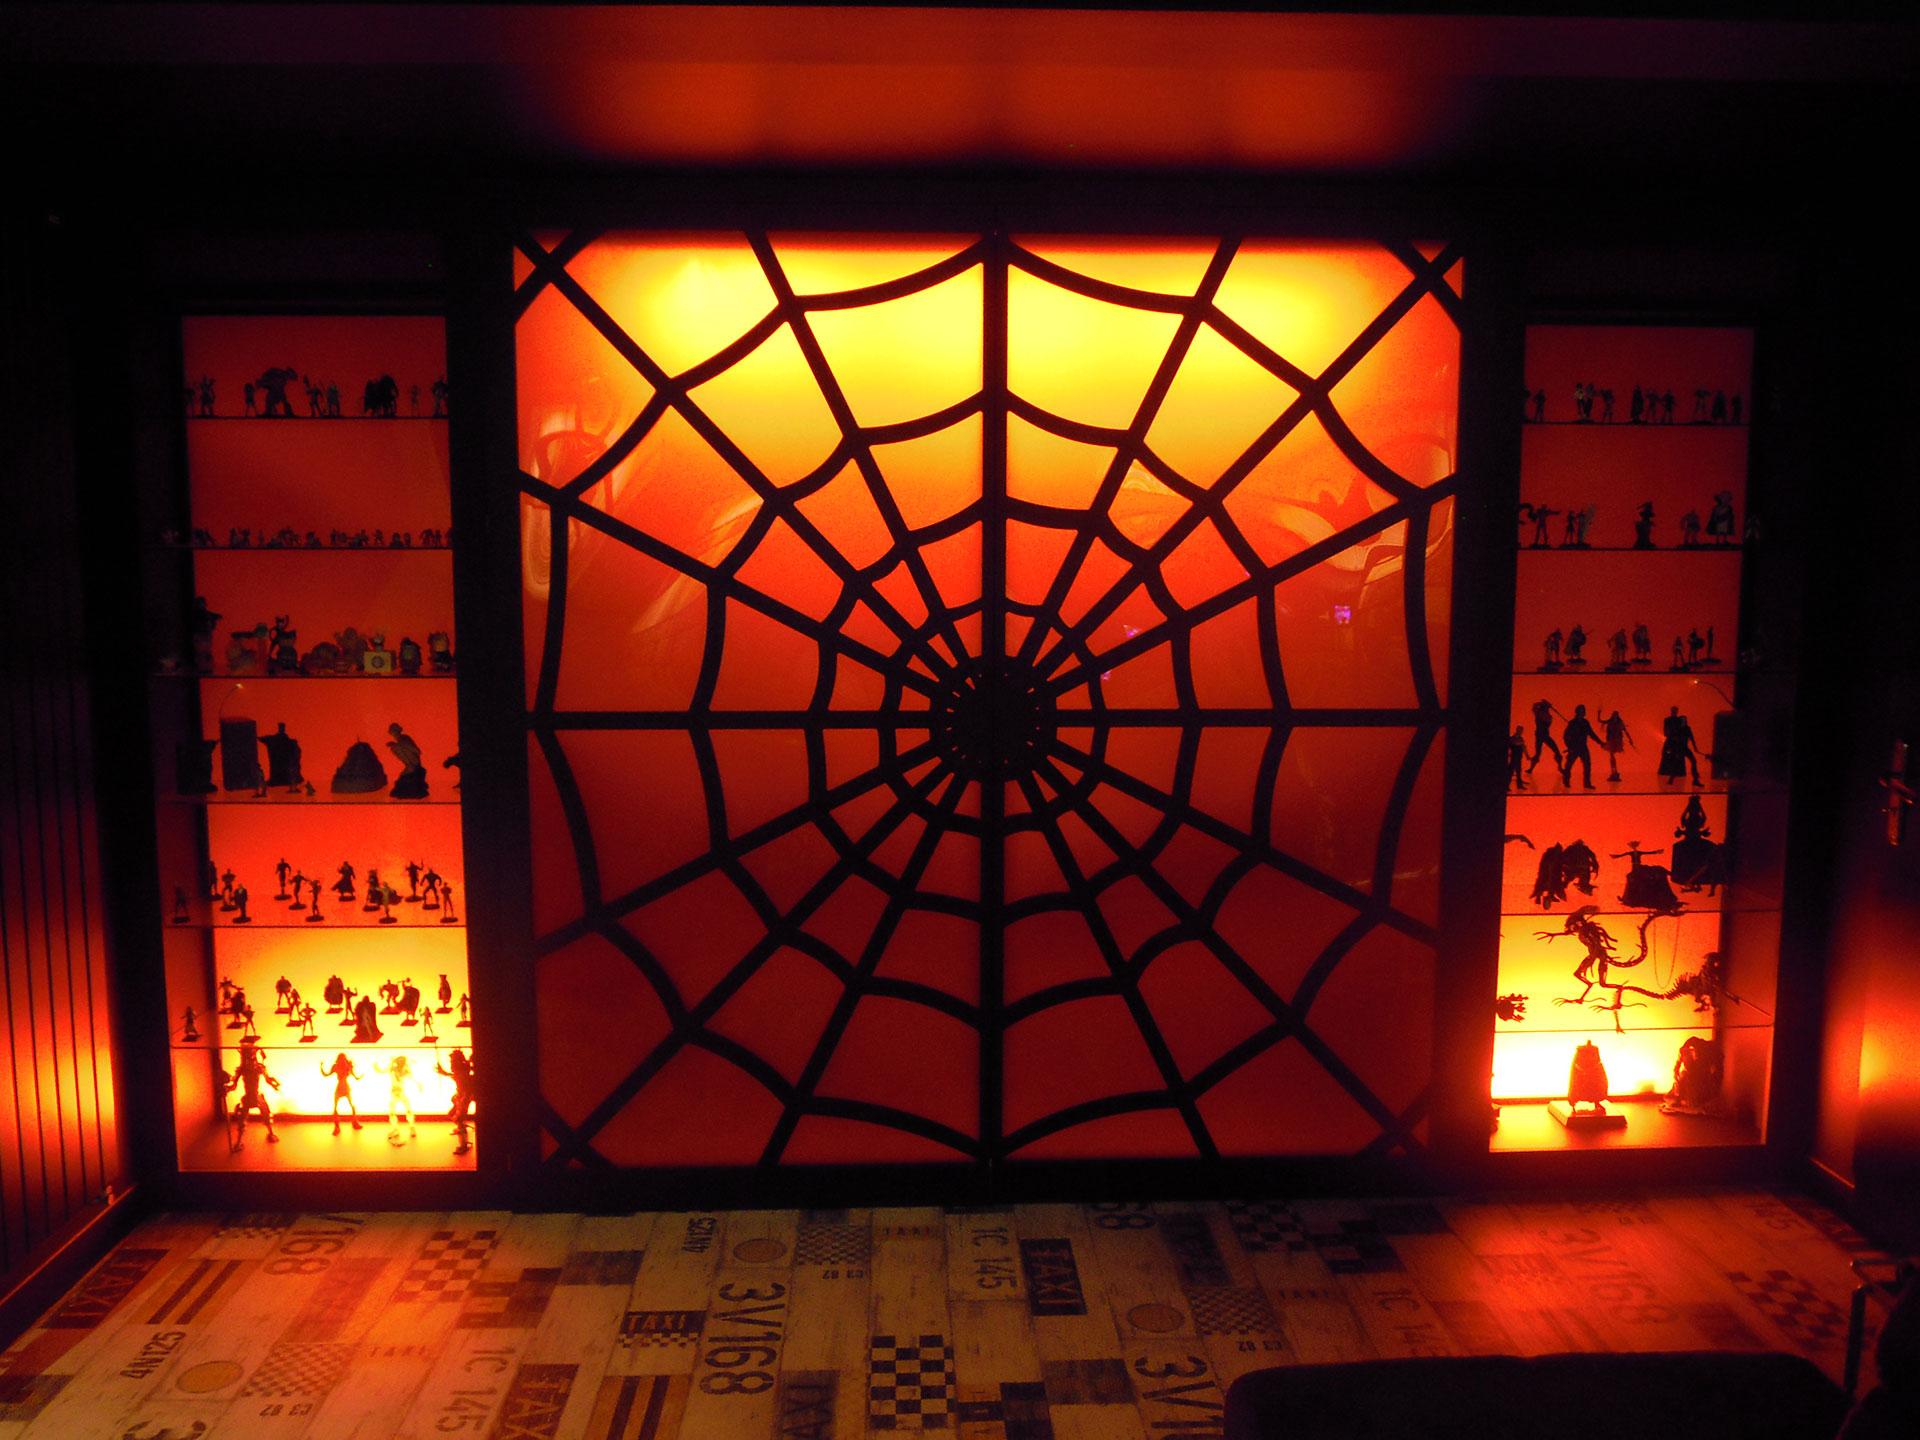 spider-boiserie-amenagement-interieur-quasart